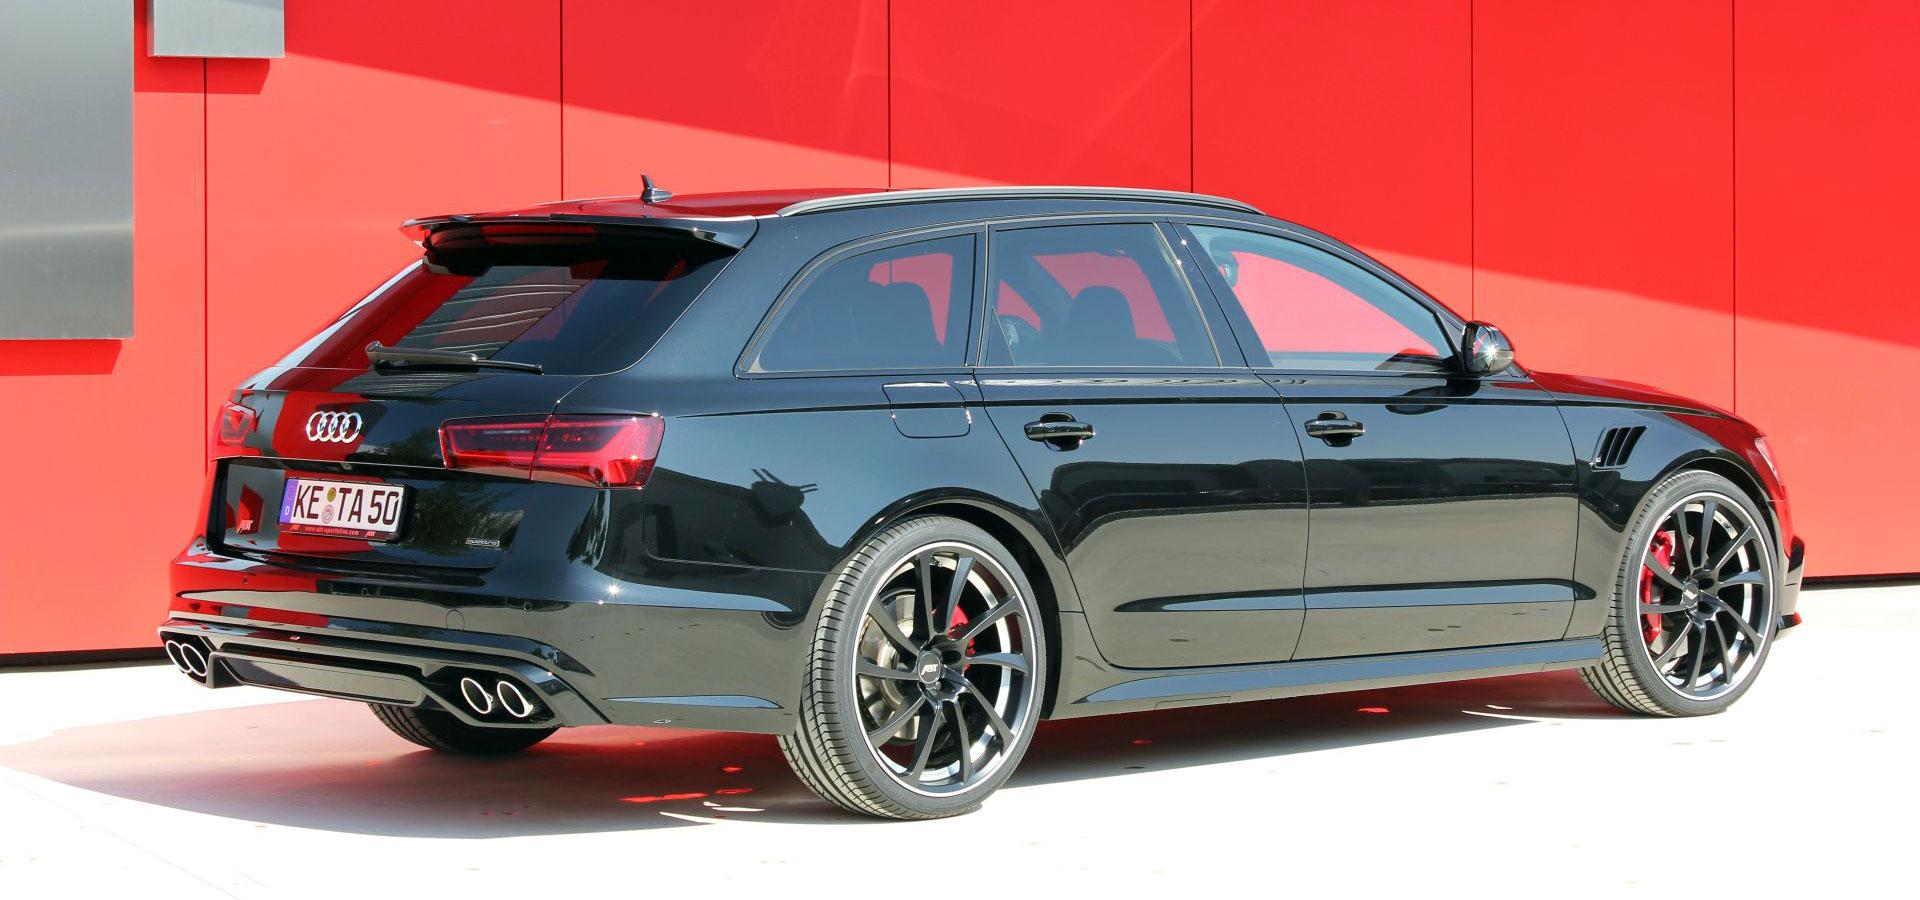 Abt macht audi rs3 noch sportlicher for Audi rs3 scheda tecnica